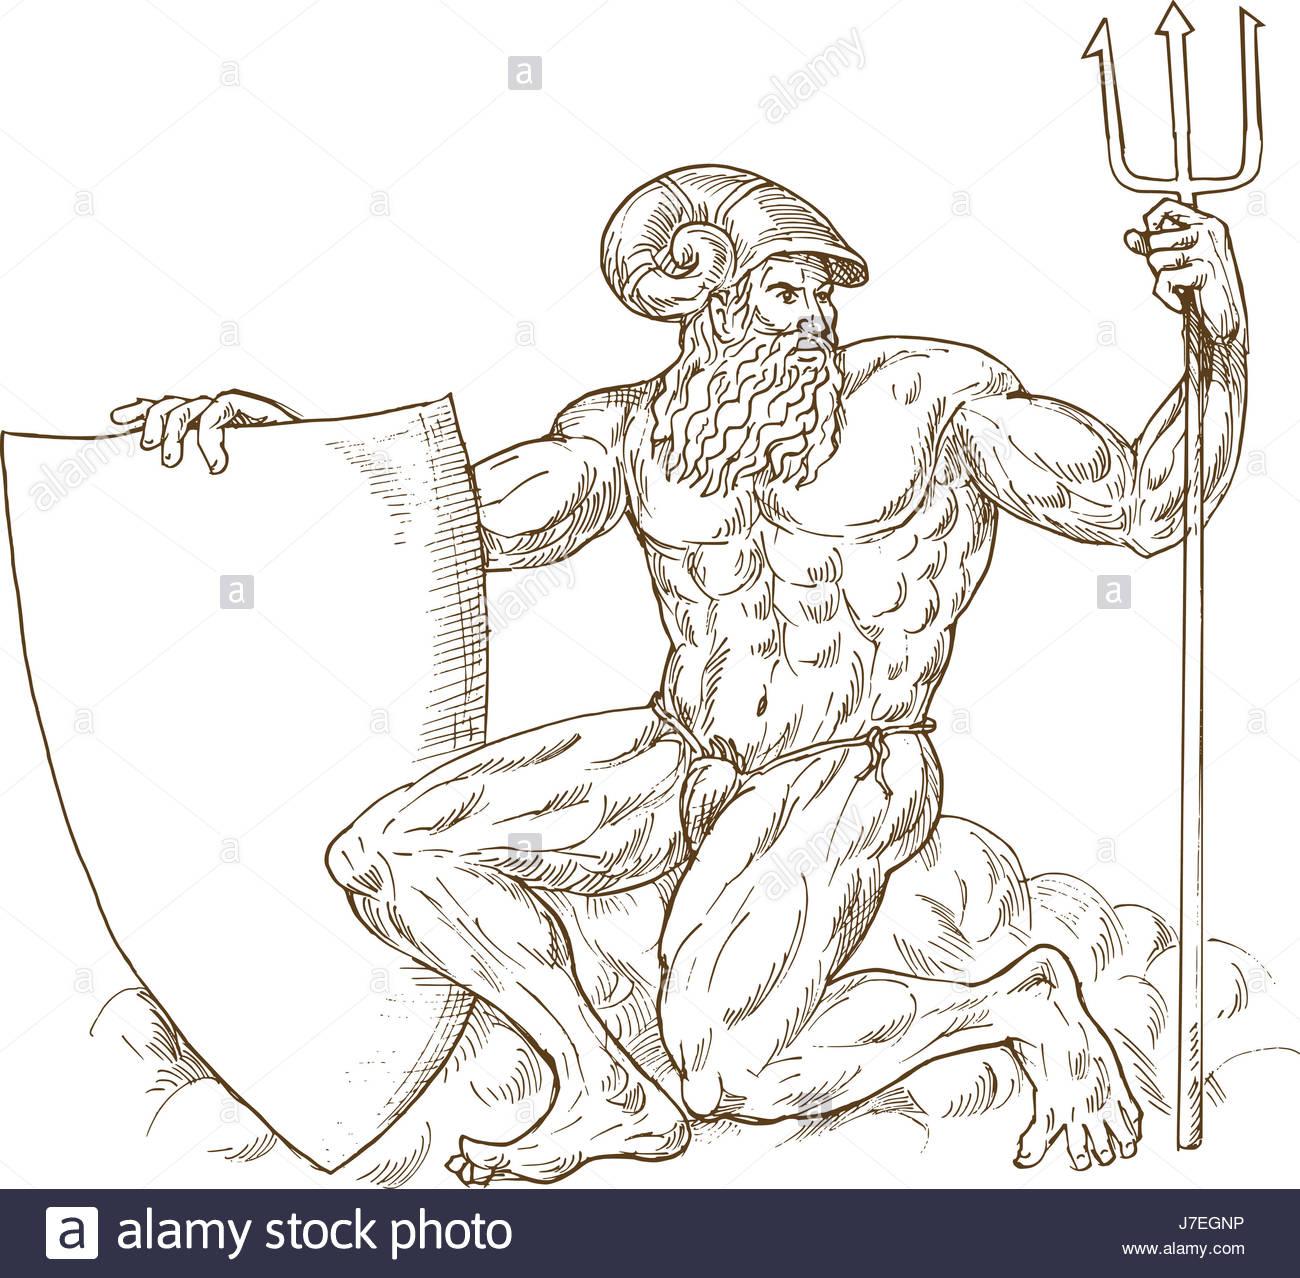 1300x1278 God Drawing Photo Picture Image Copy Deduction Roman Trident